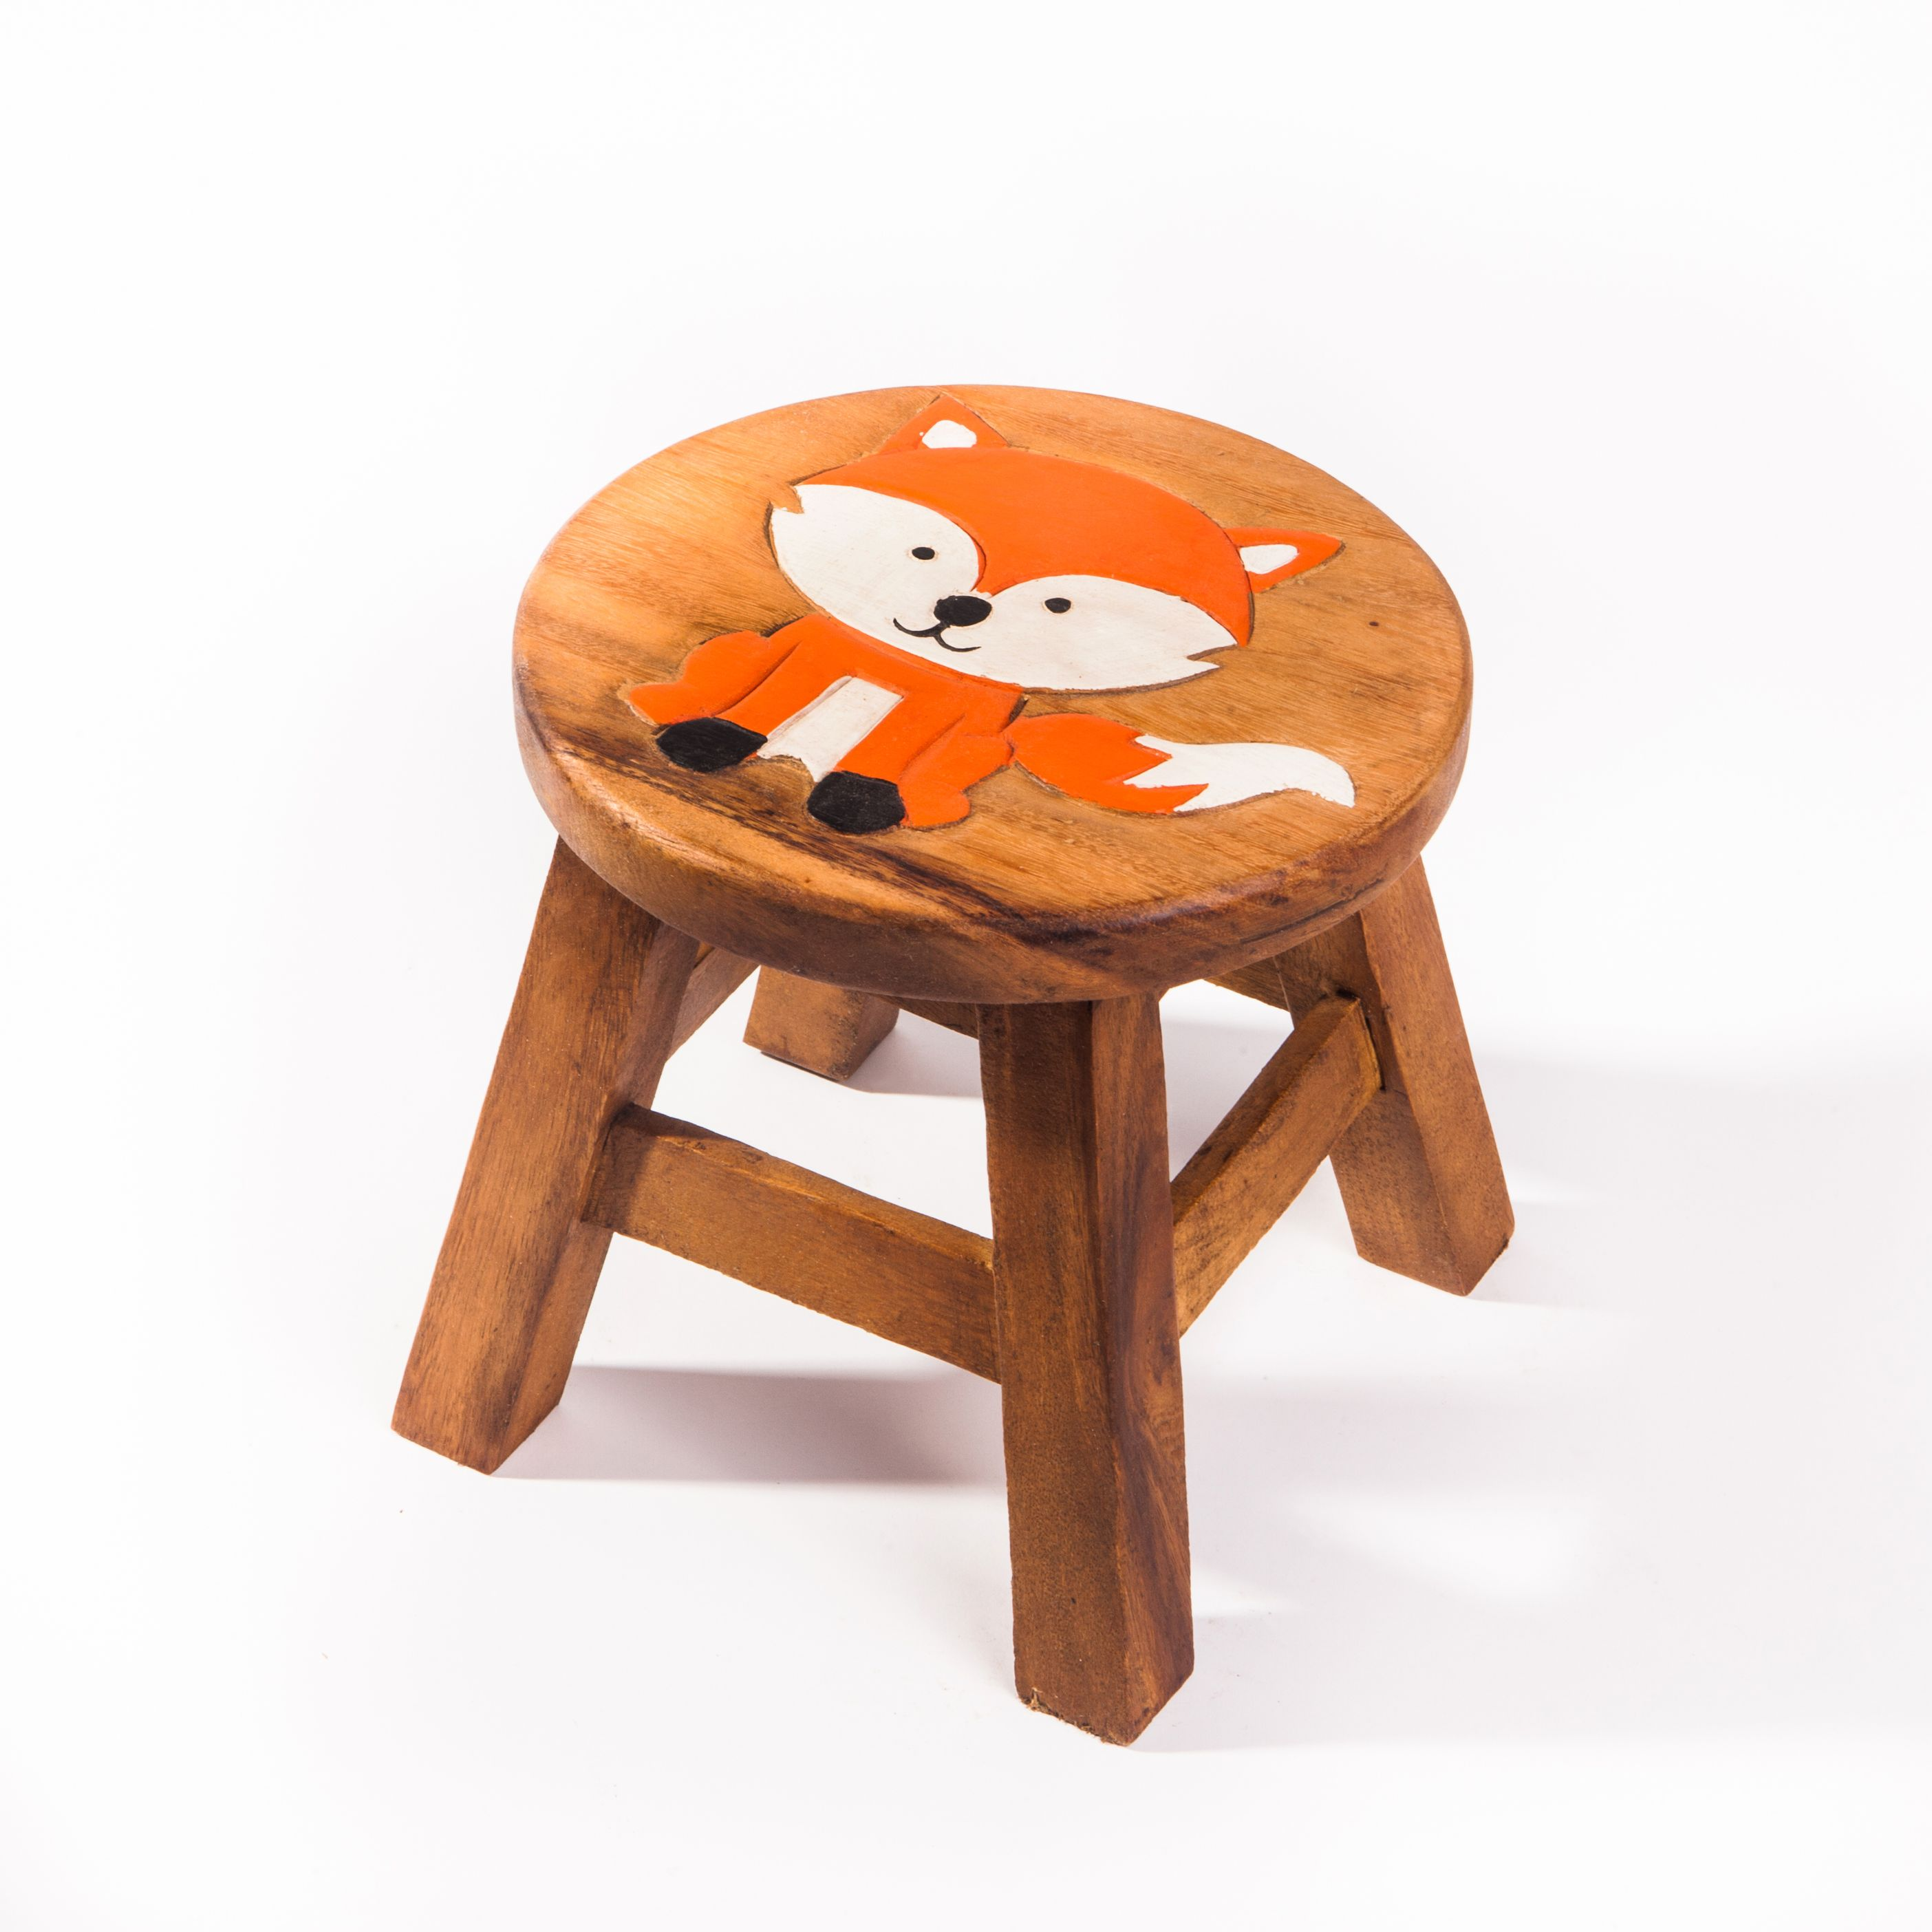 Kinderhocker Hocker aus Holz Sitzgruppe Kinderstuhl Eule Holz